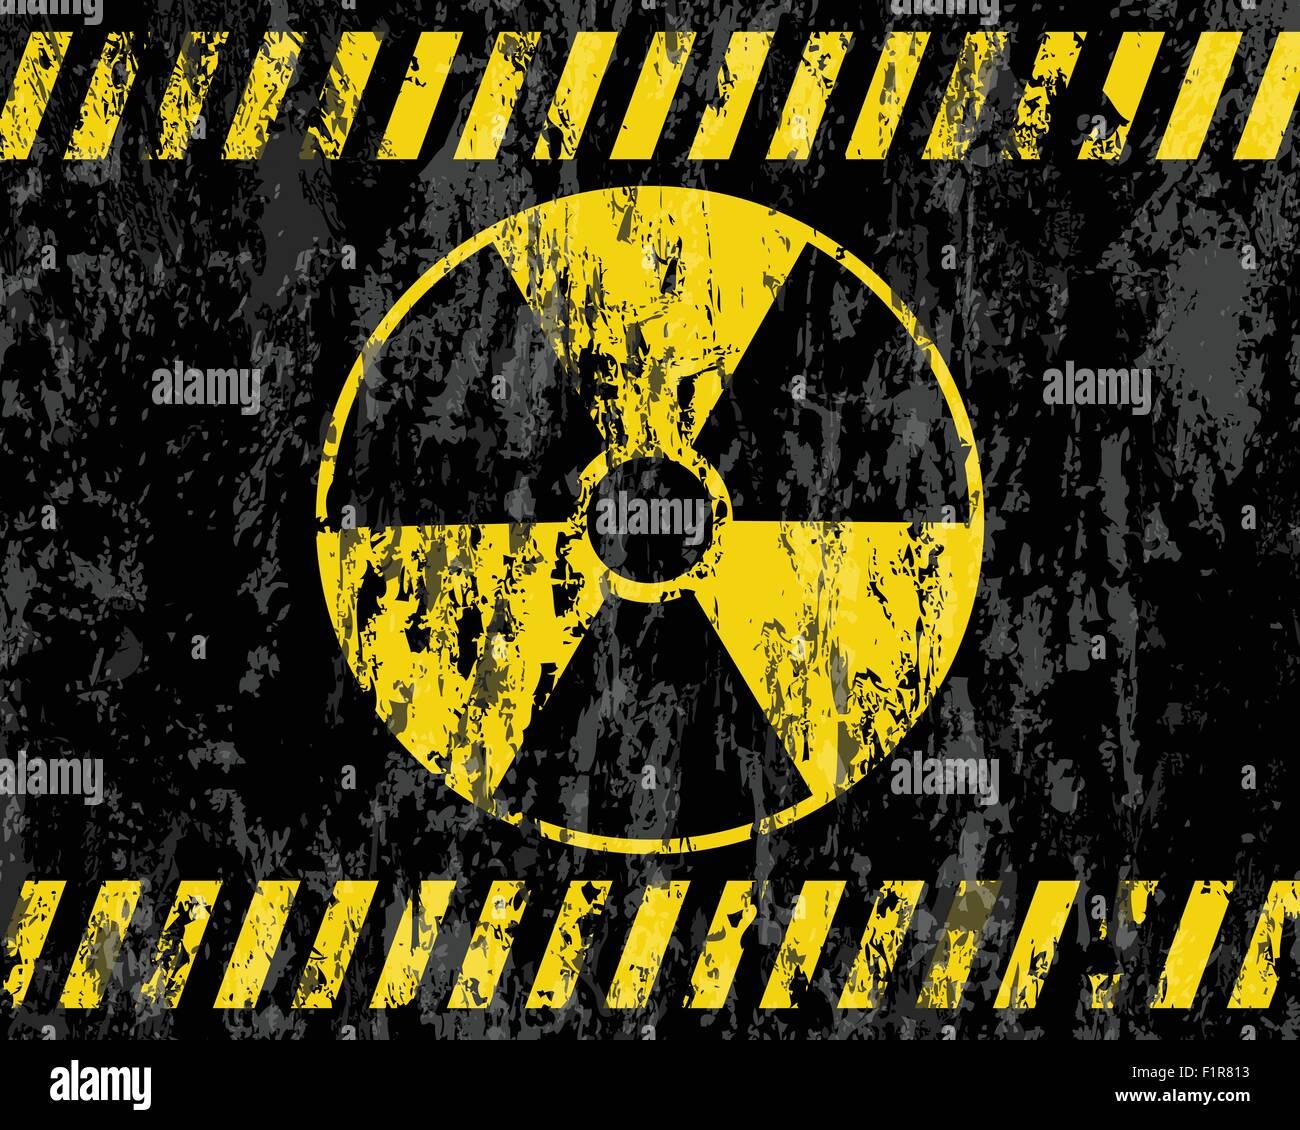 grunge radiation sign background. Vector illustrator. - Stock Image